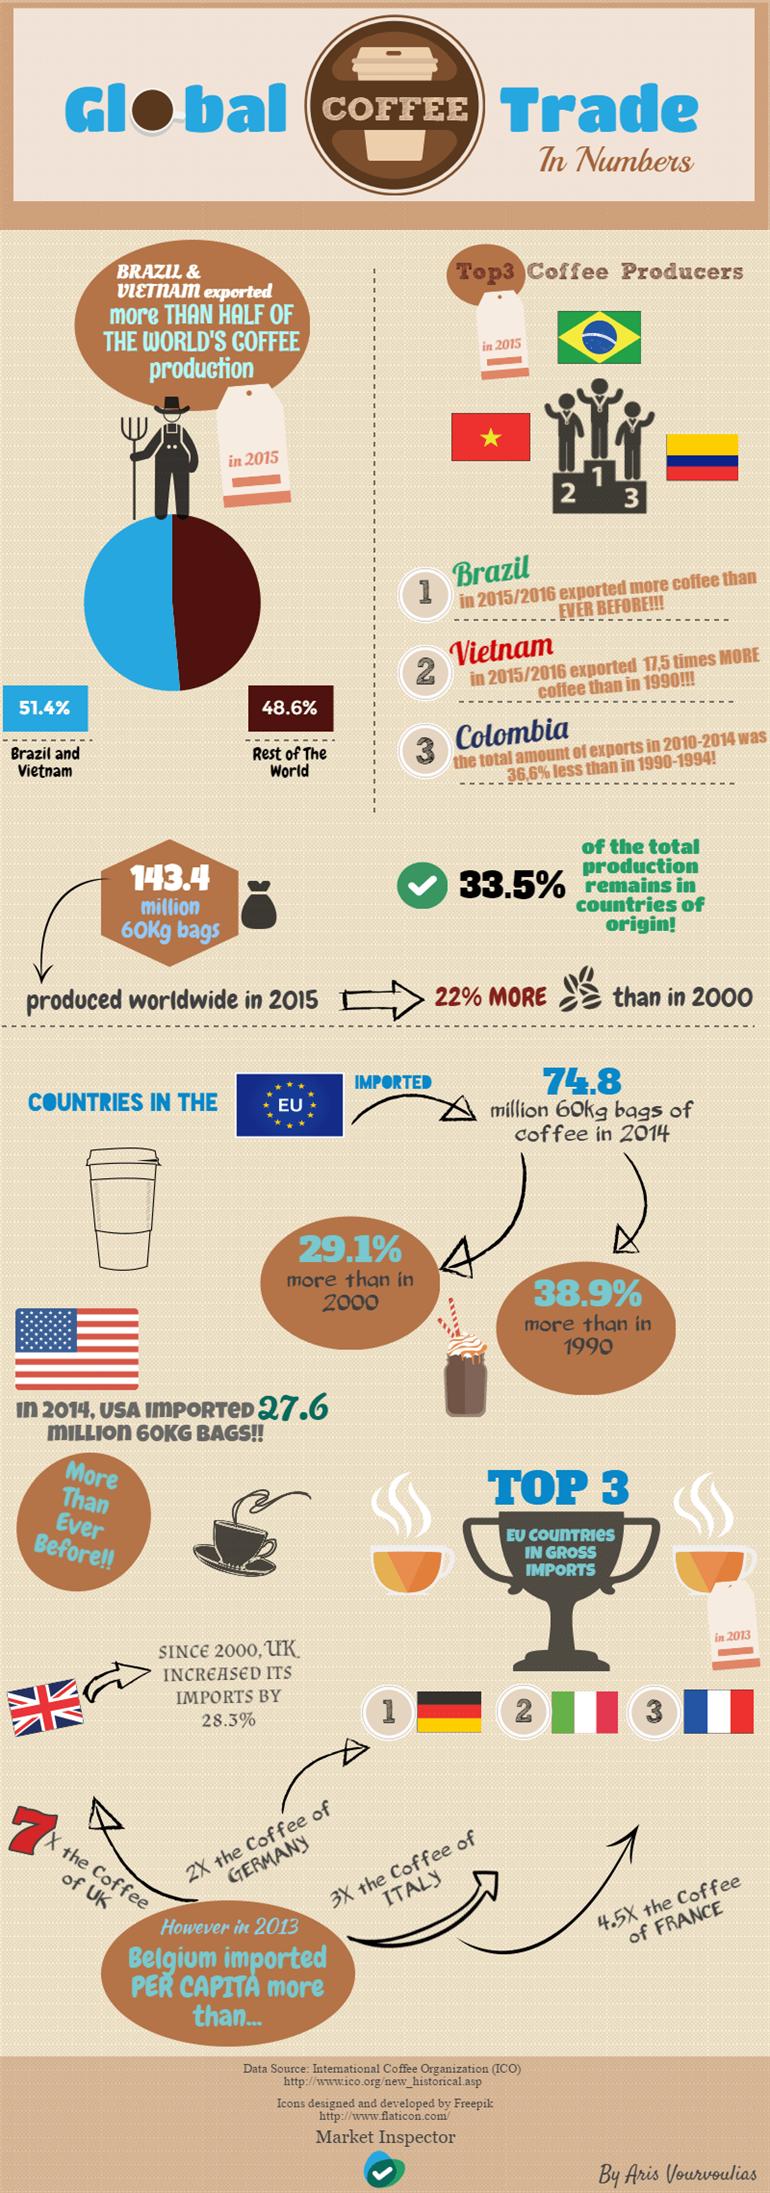 Infographic Global Coffee Trade_770x2193 (1)